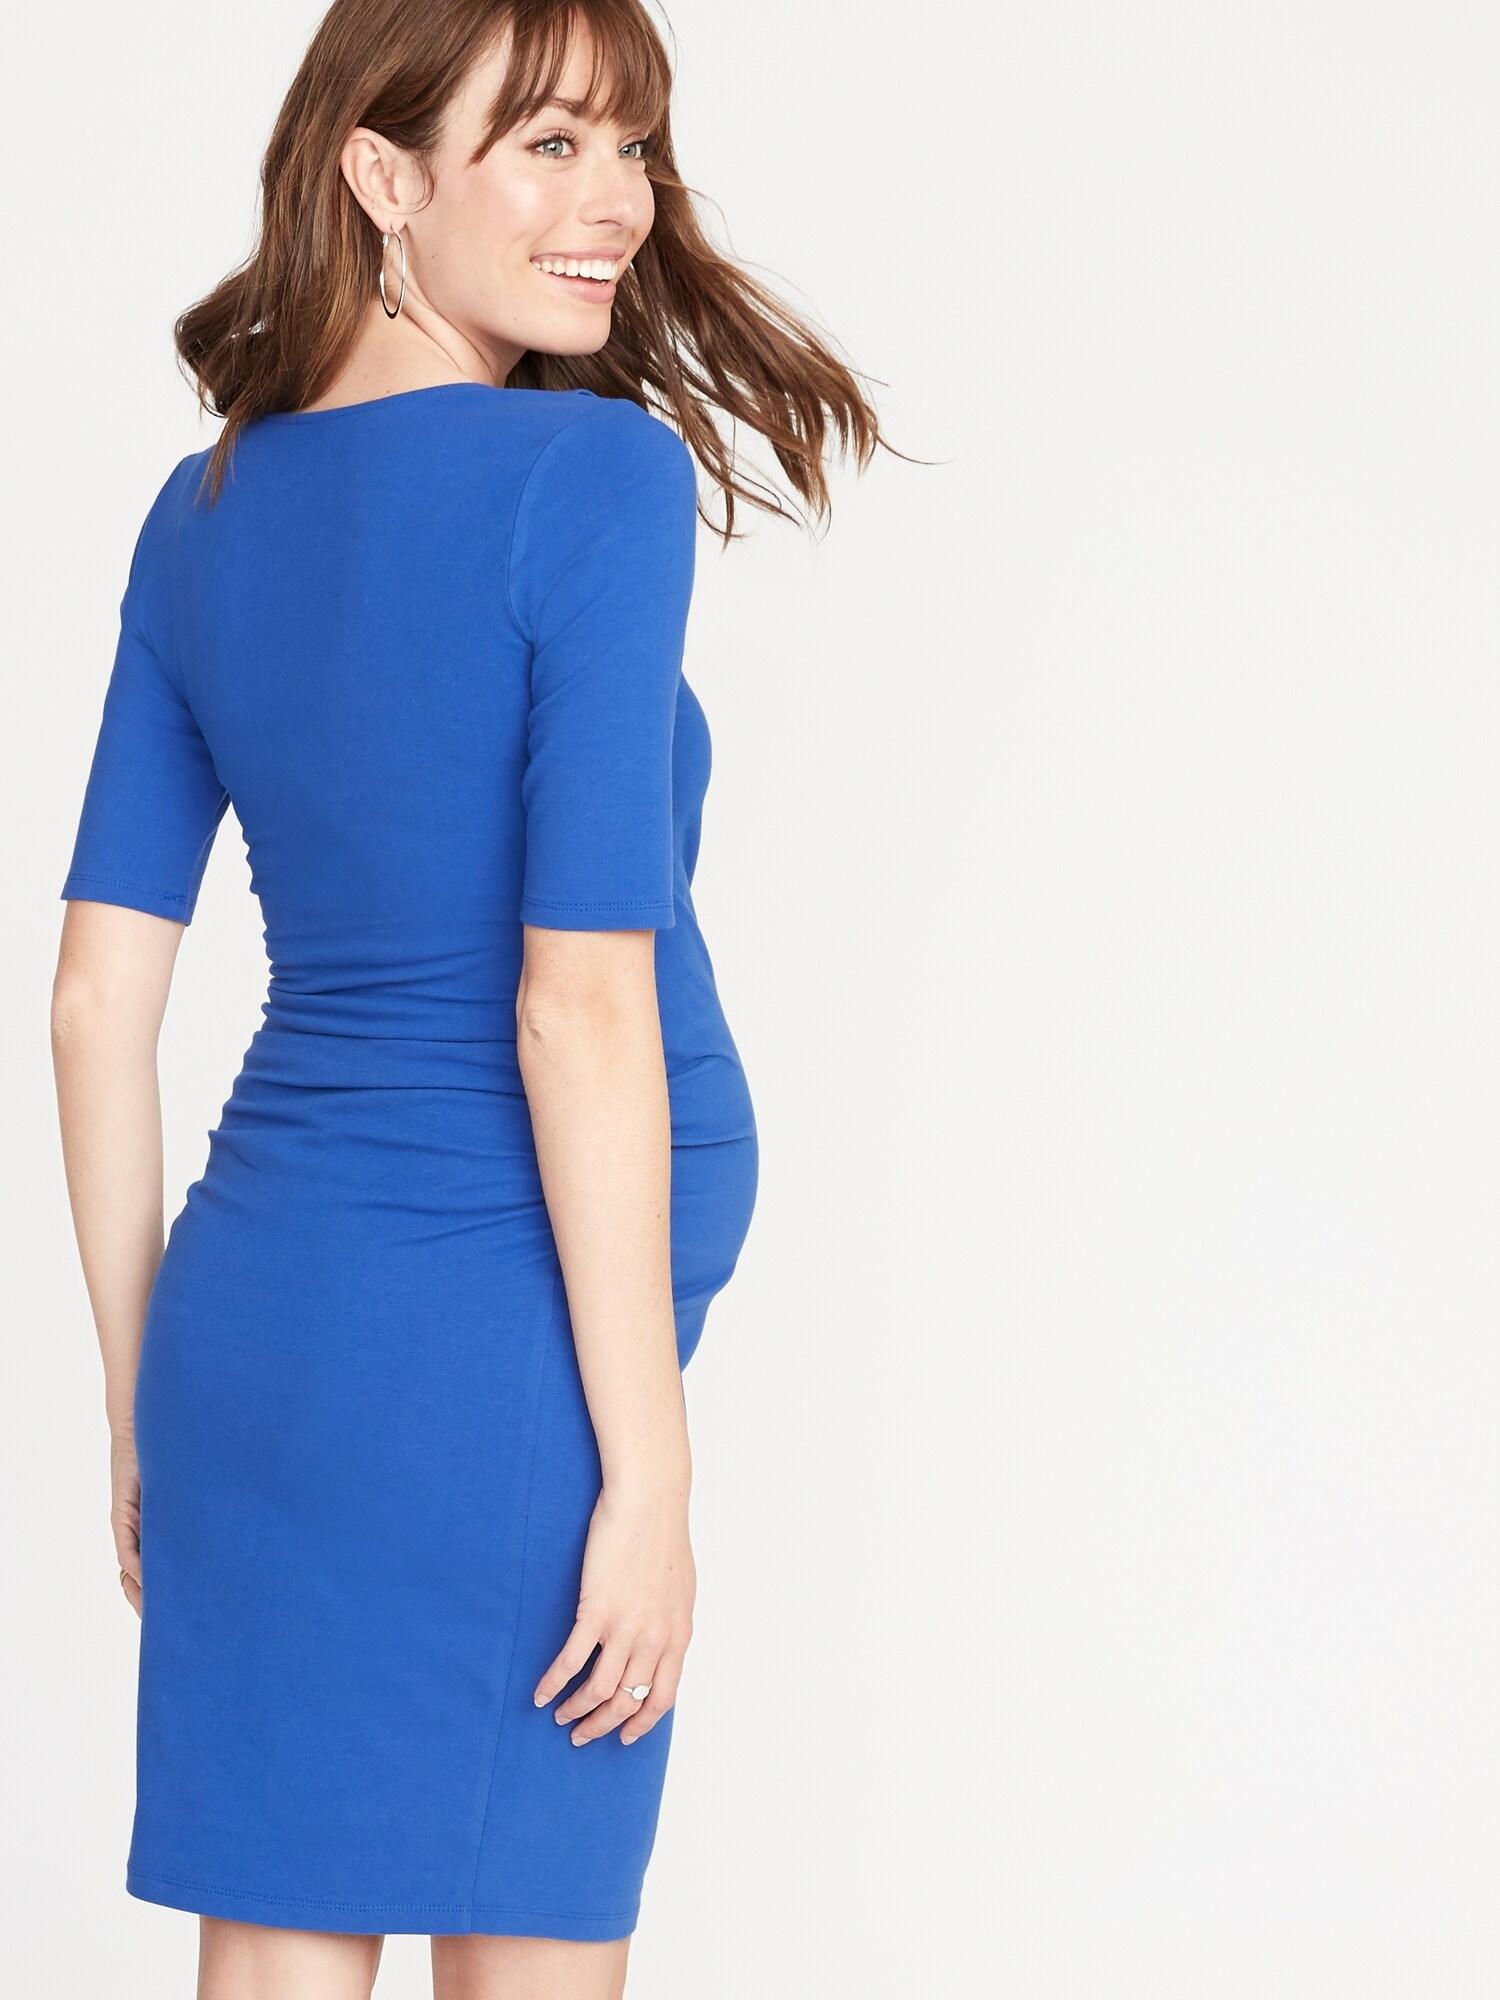 7babbf0d633 Maternity Ruffled Surplice Bodycon Dress